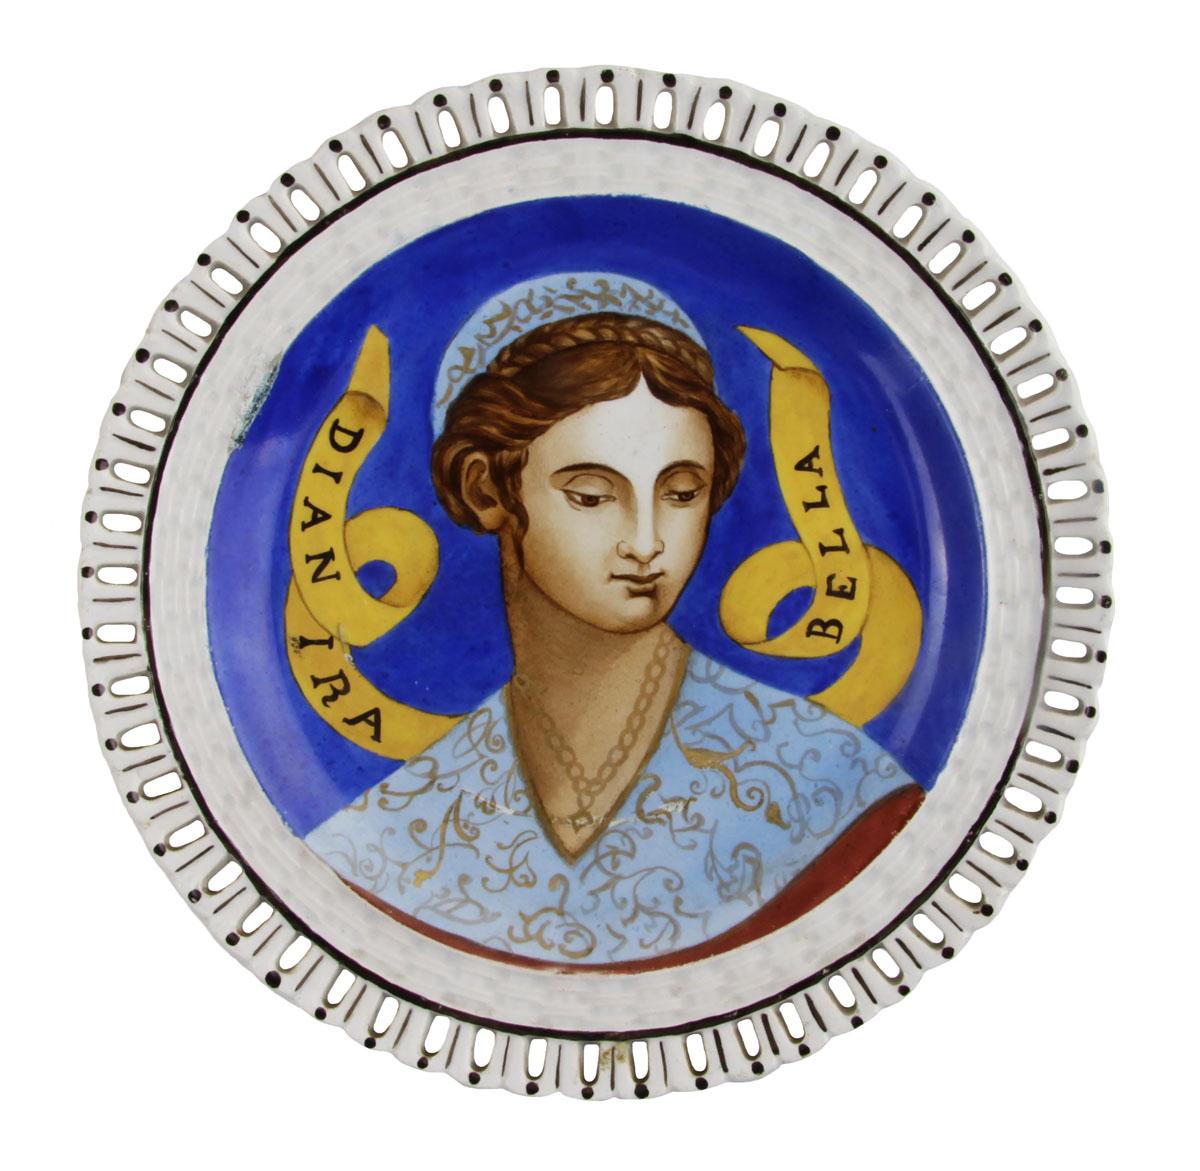 Тарелка Прекрасная незнакомка. Фарфор, роспись. Luneville, Франция, начало XX века